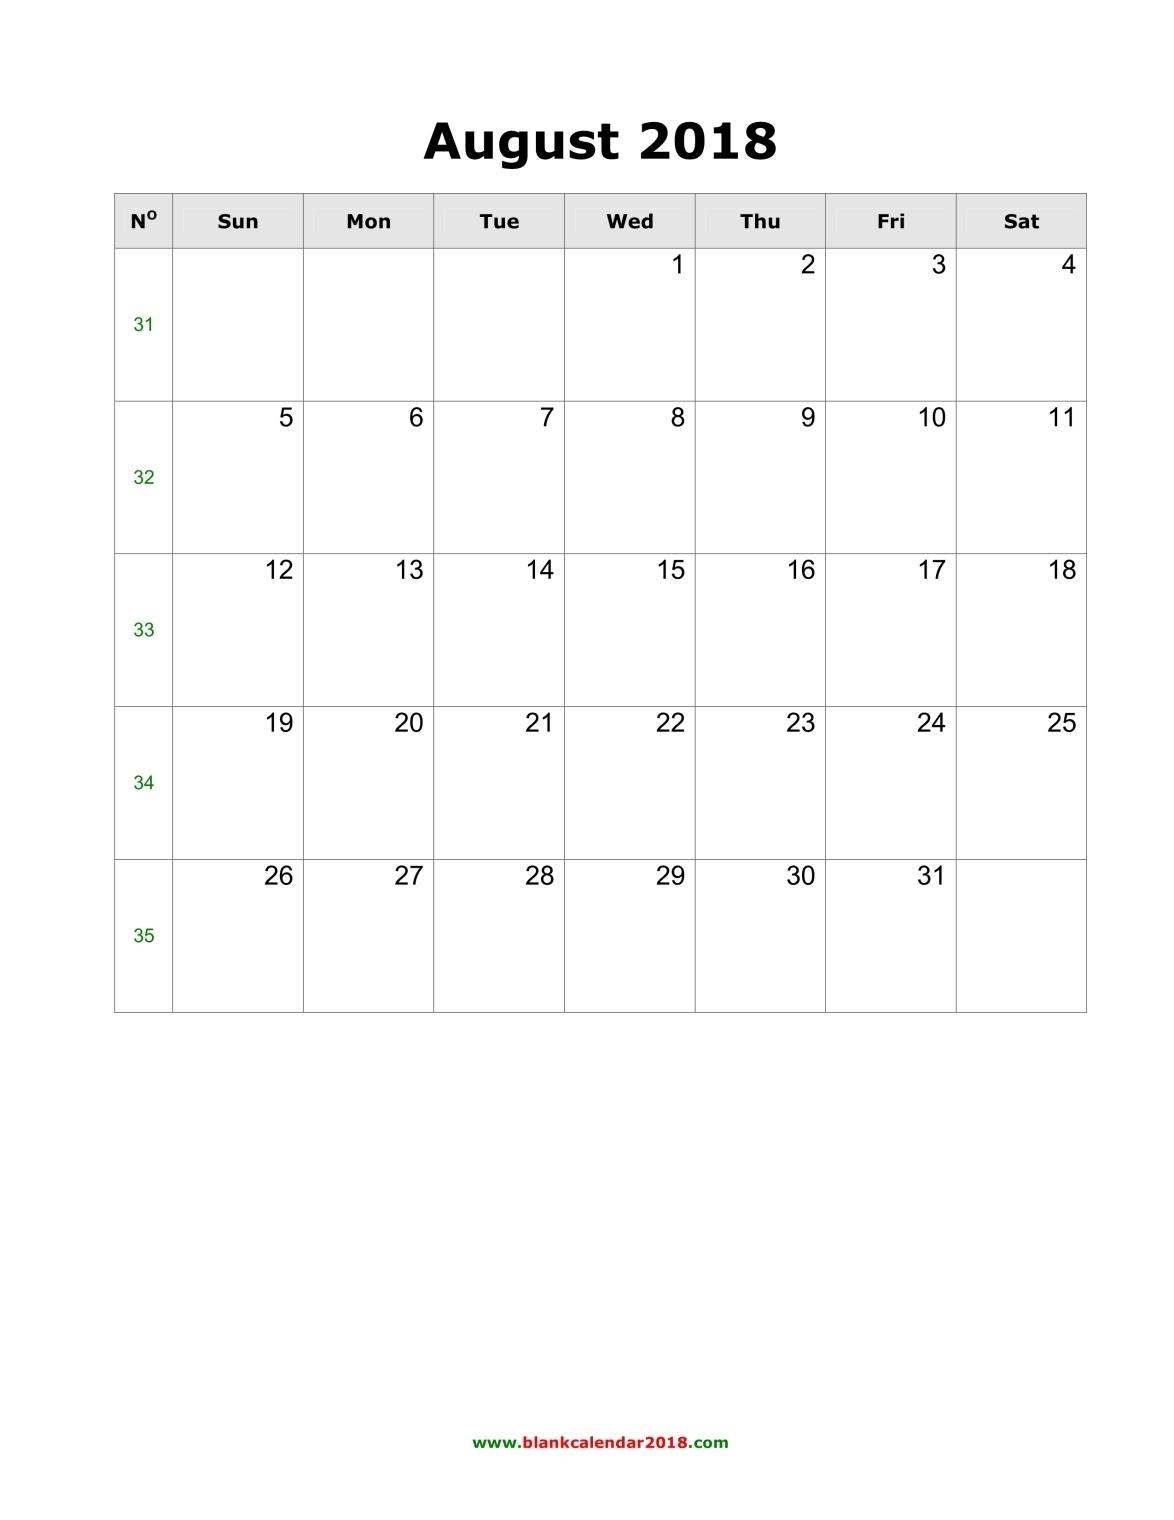 August 2018 Calendar Blank Portrait